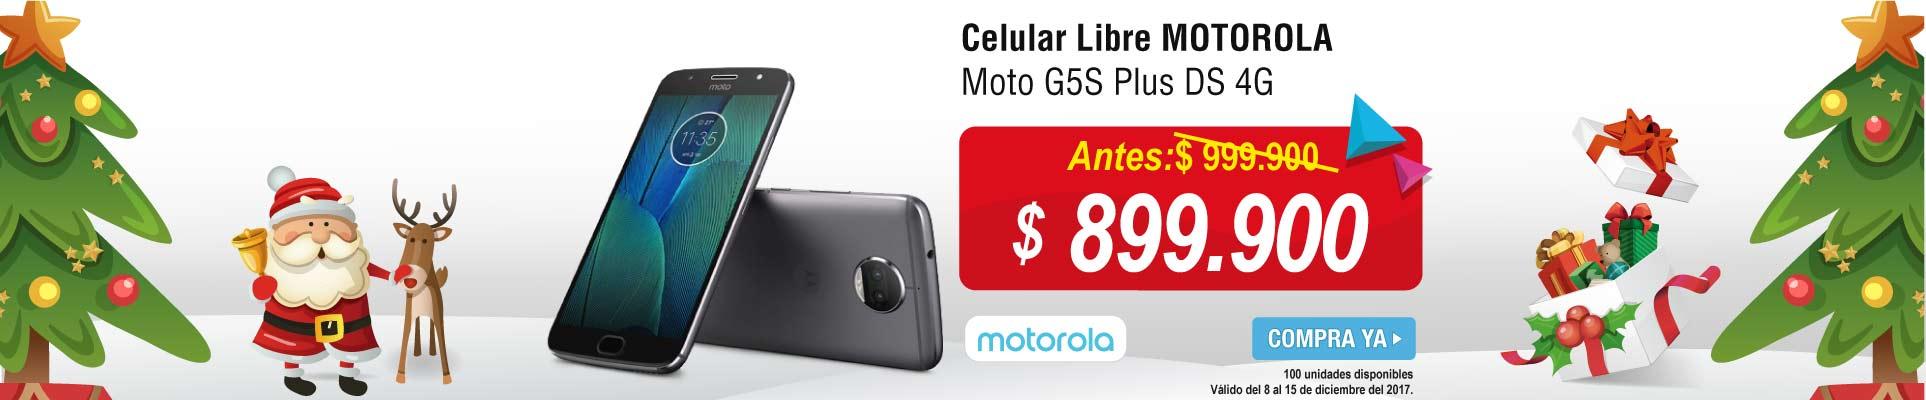 PPAL ALKP-1-celulares-Celular Libre MOTOROLA Moto G5S Plus DS-prod-diciembre8-15-marcas